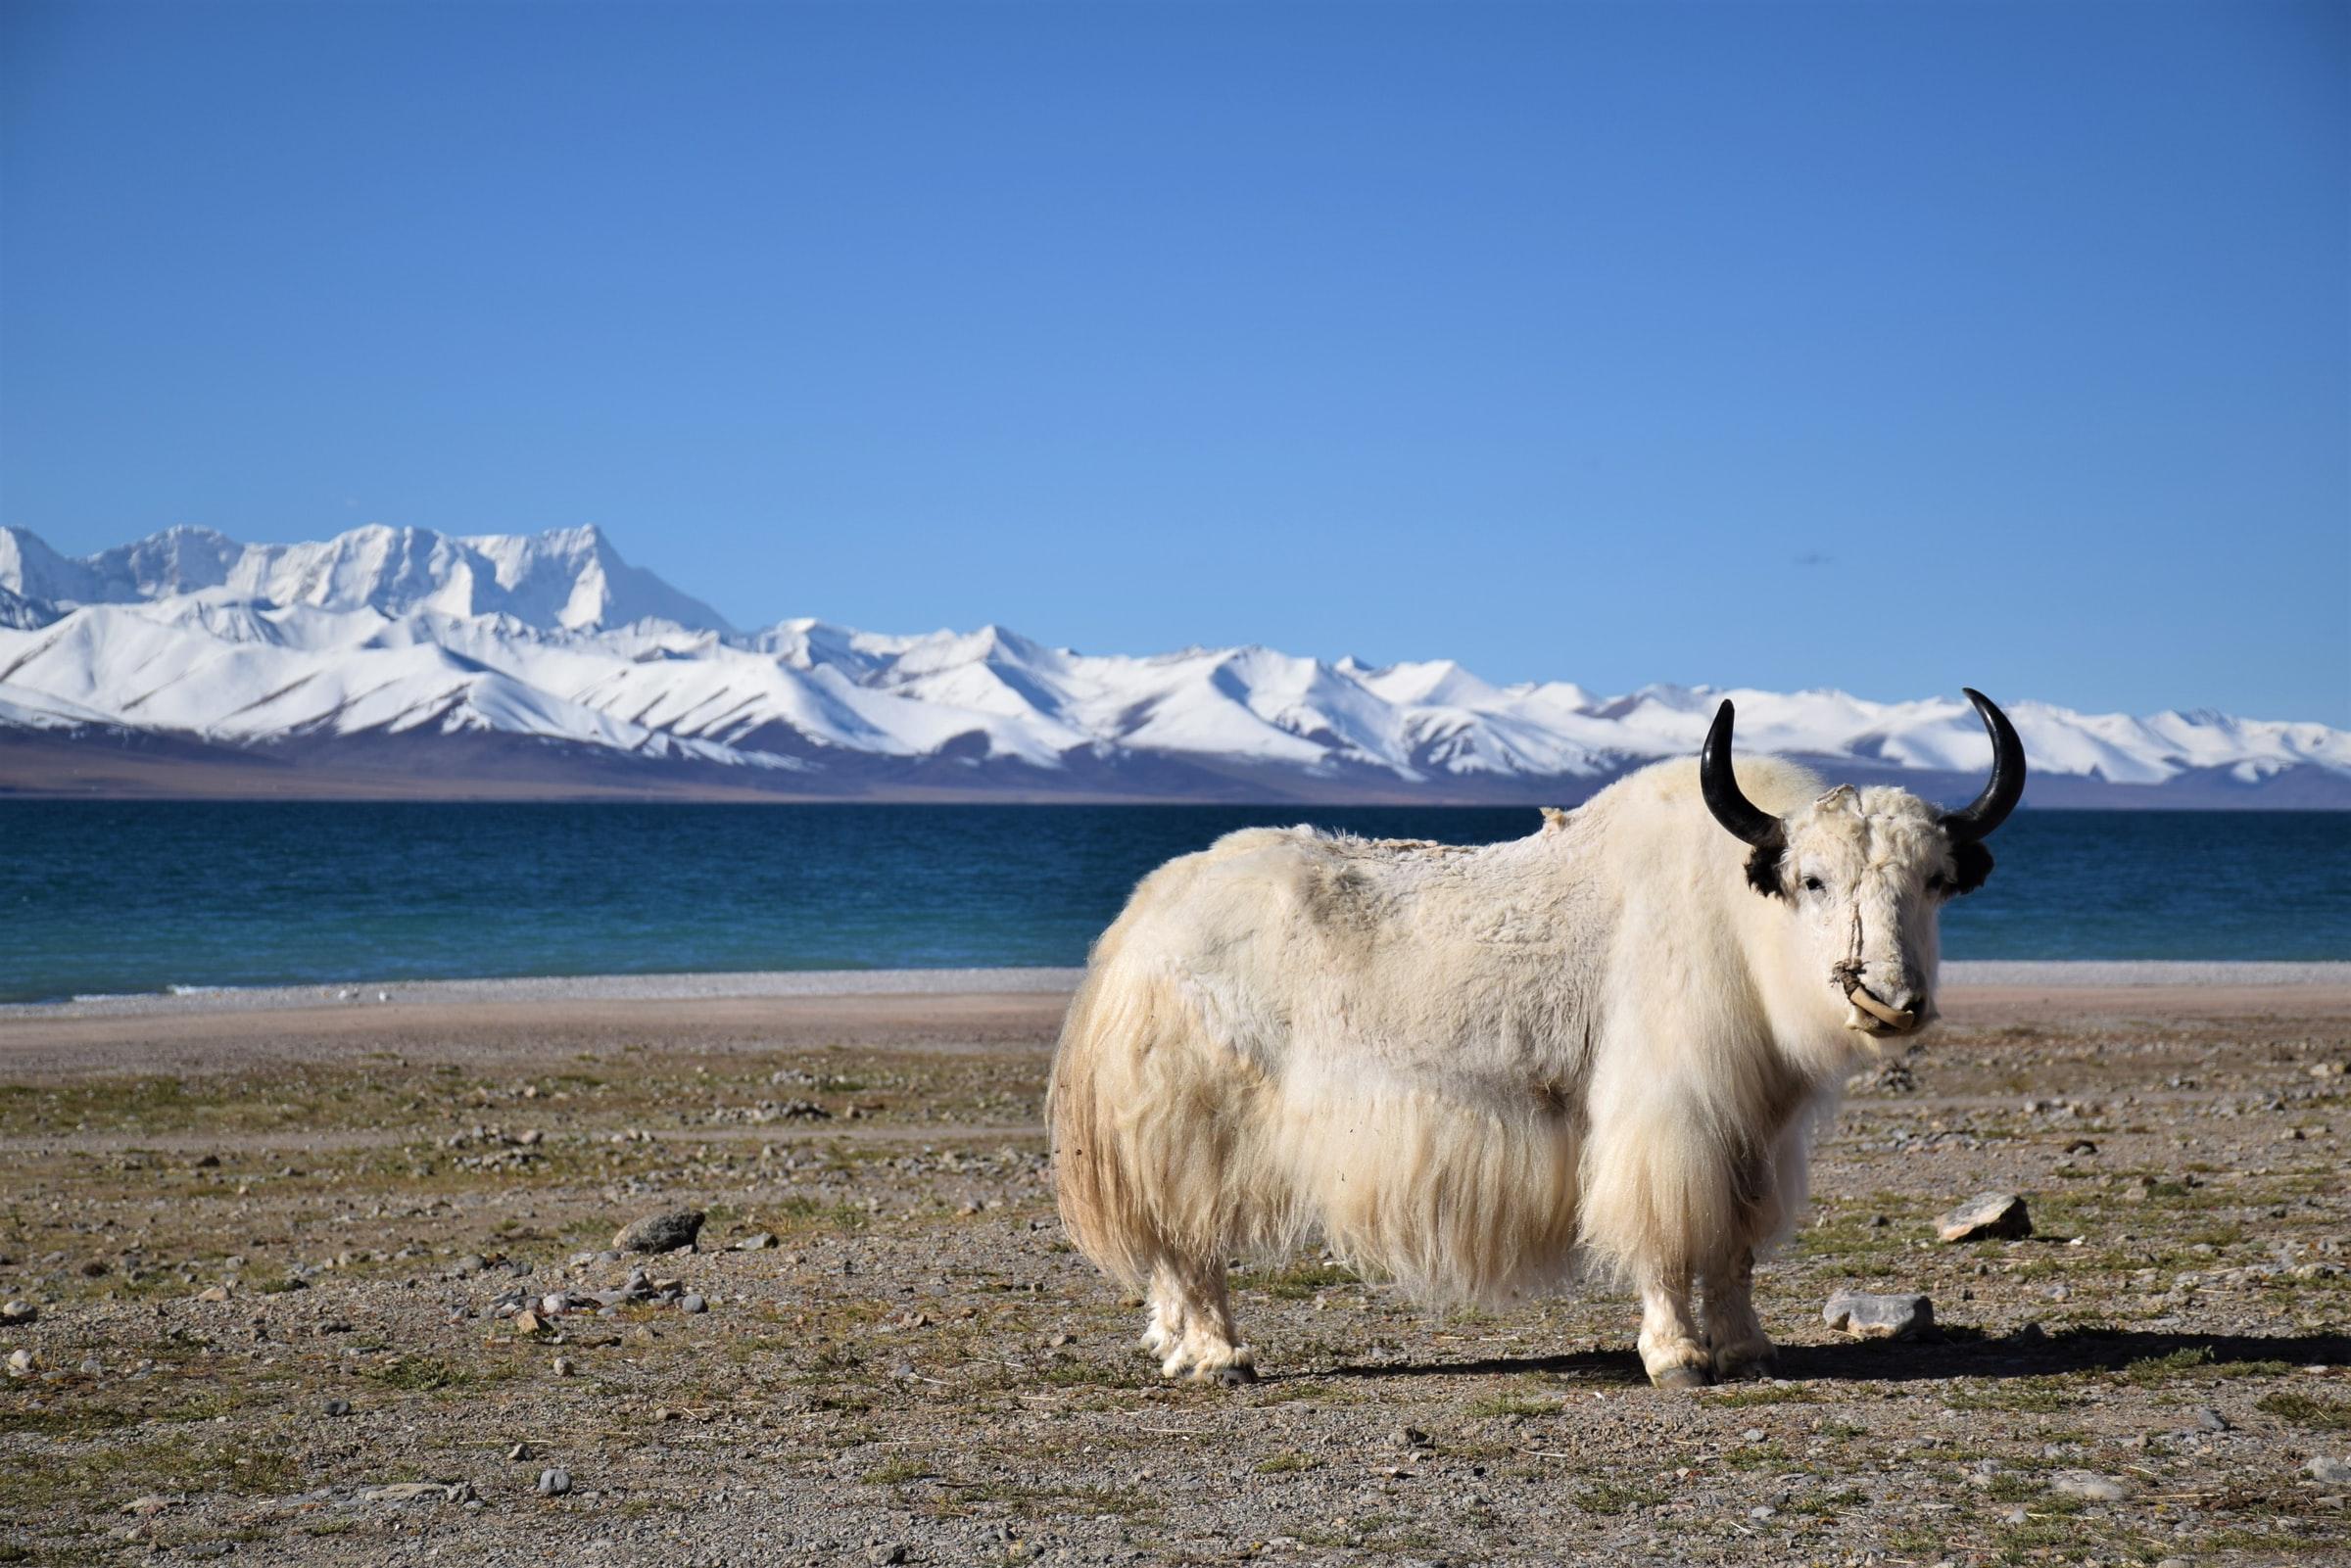 Jak in Tibet an See im Hochgebirge